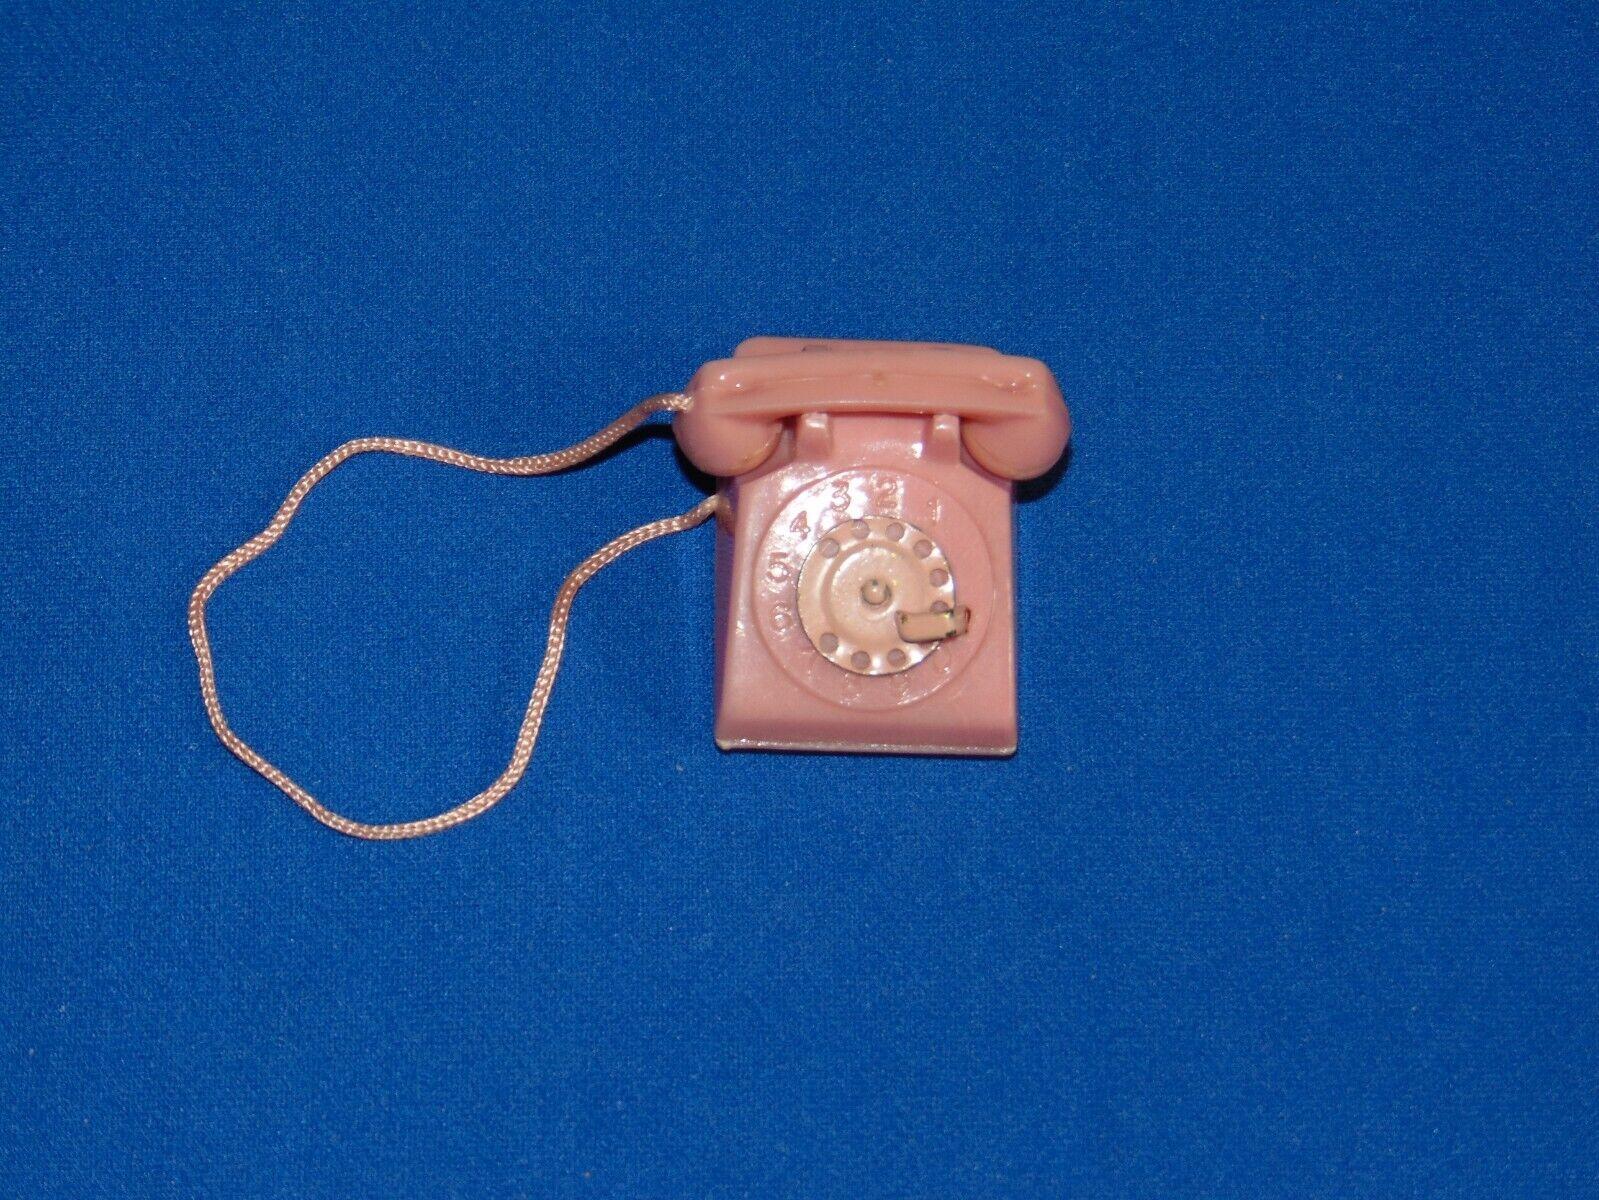 VINTAGE BARBIE SUBURBAN SHOPPER EARLY PINK TELEPHONE METAL DIAL PHONE - $53.50